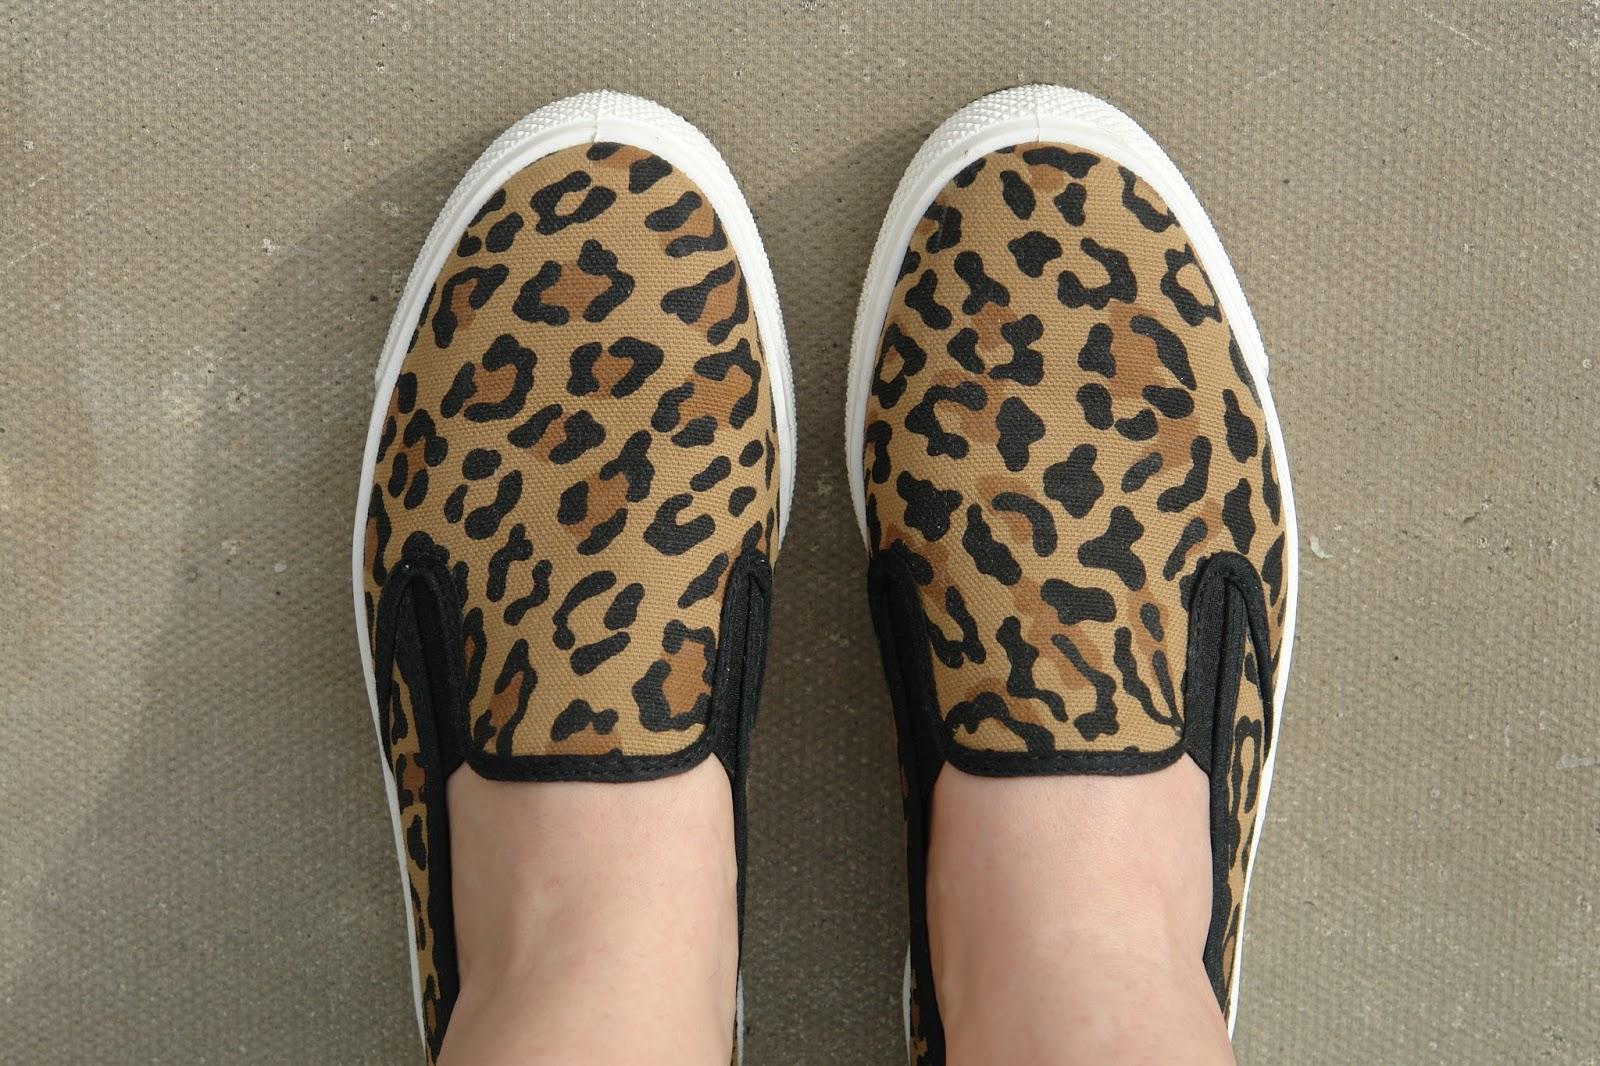 ASOS leopard print slip-on shoes, ASOS Dockland plimsolls, leopard print, ASOS, leopard, shoes, 2014,